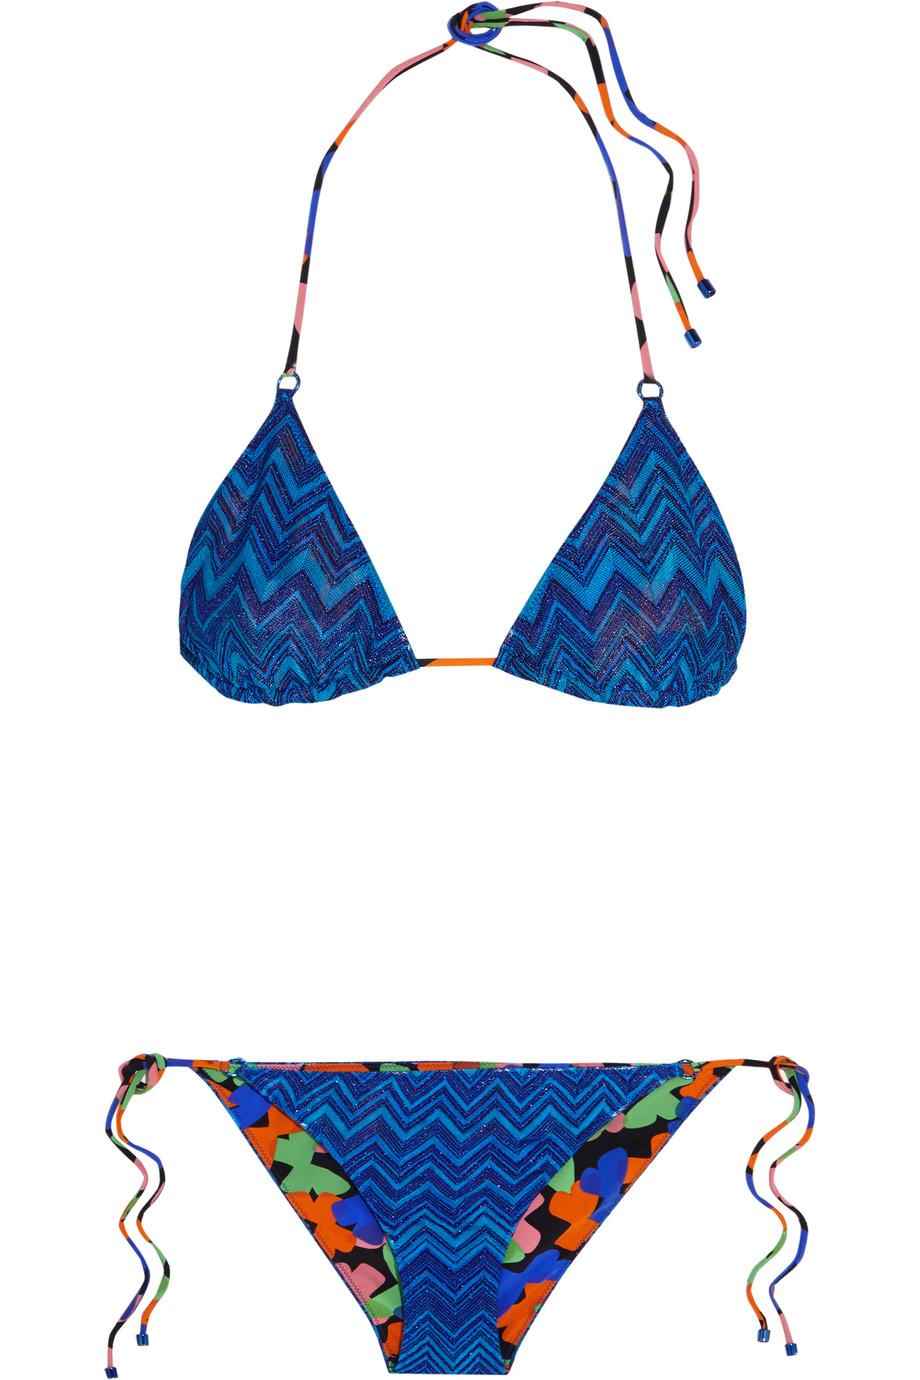 Missoni Mare Reversible Crochet-Knit Triangle Bikini, Cobalt Blue, Women's, Size: 44